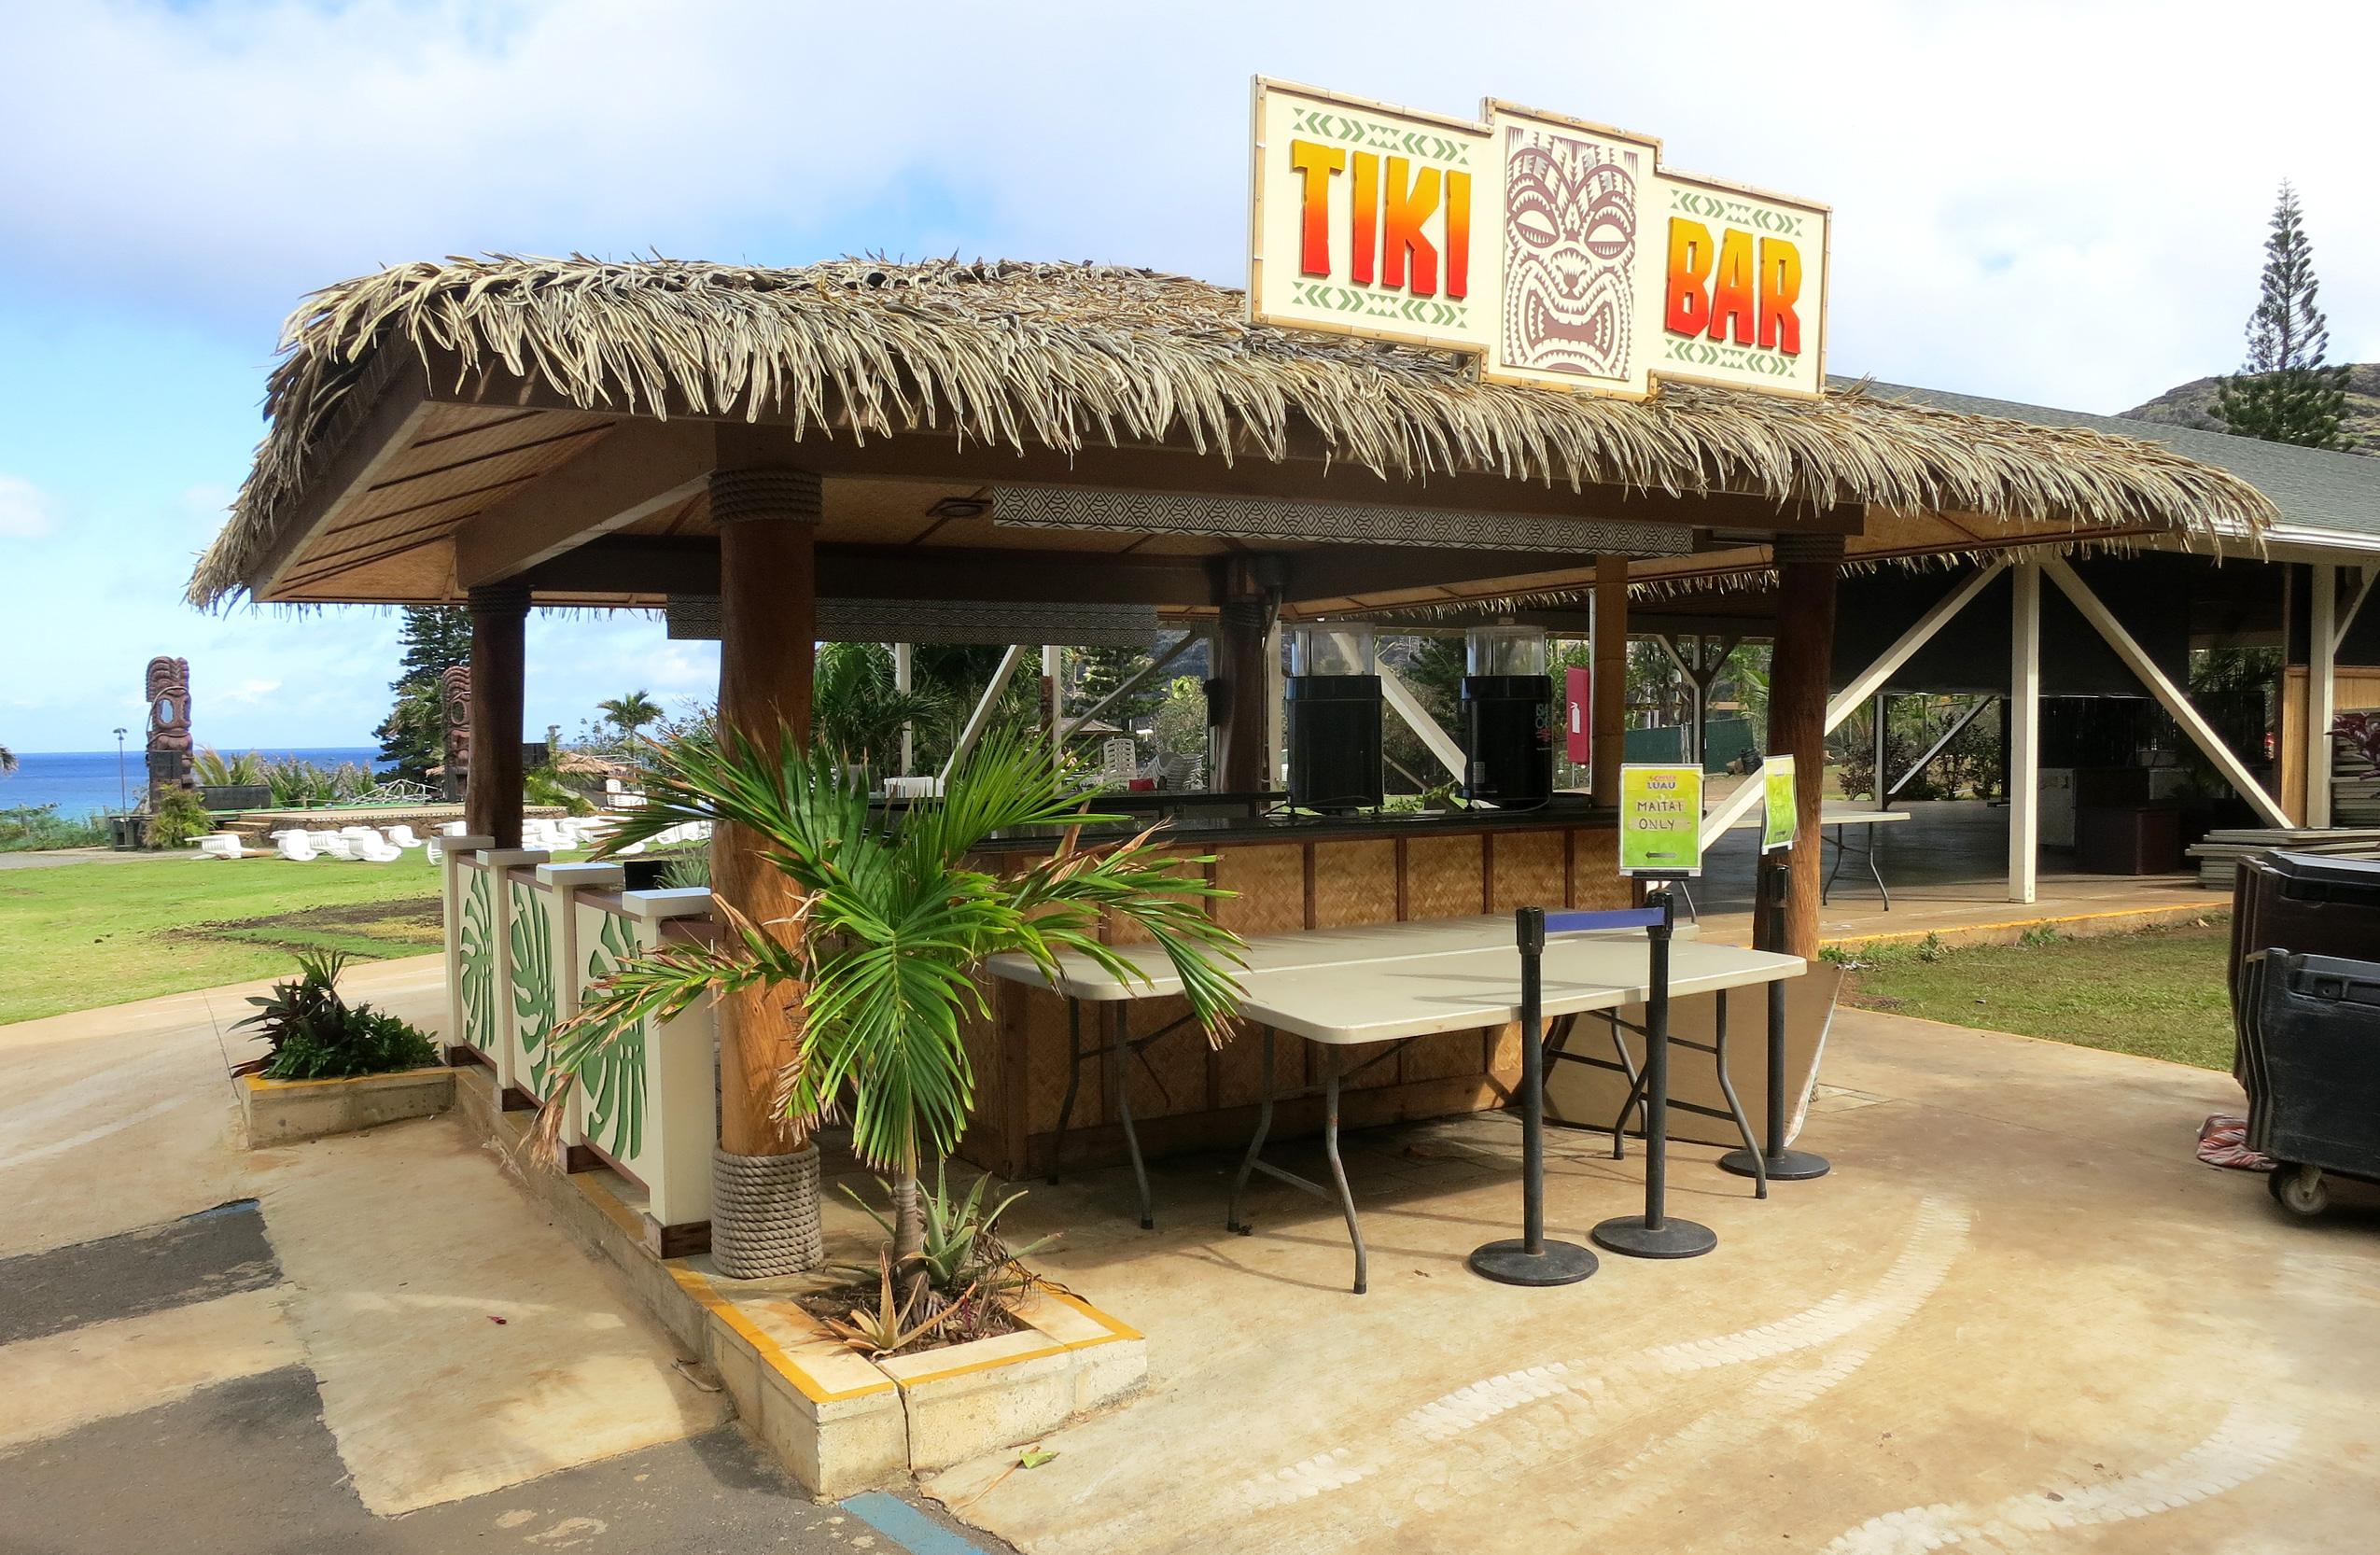 Review tiki bar candy tasty island - Restaurante tiki ...